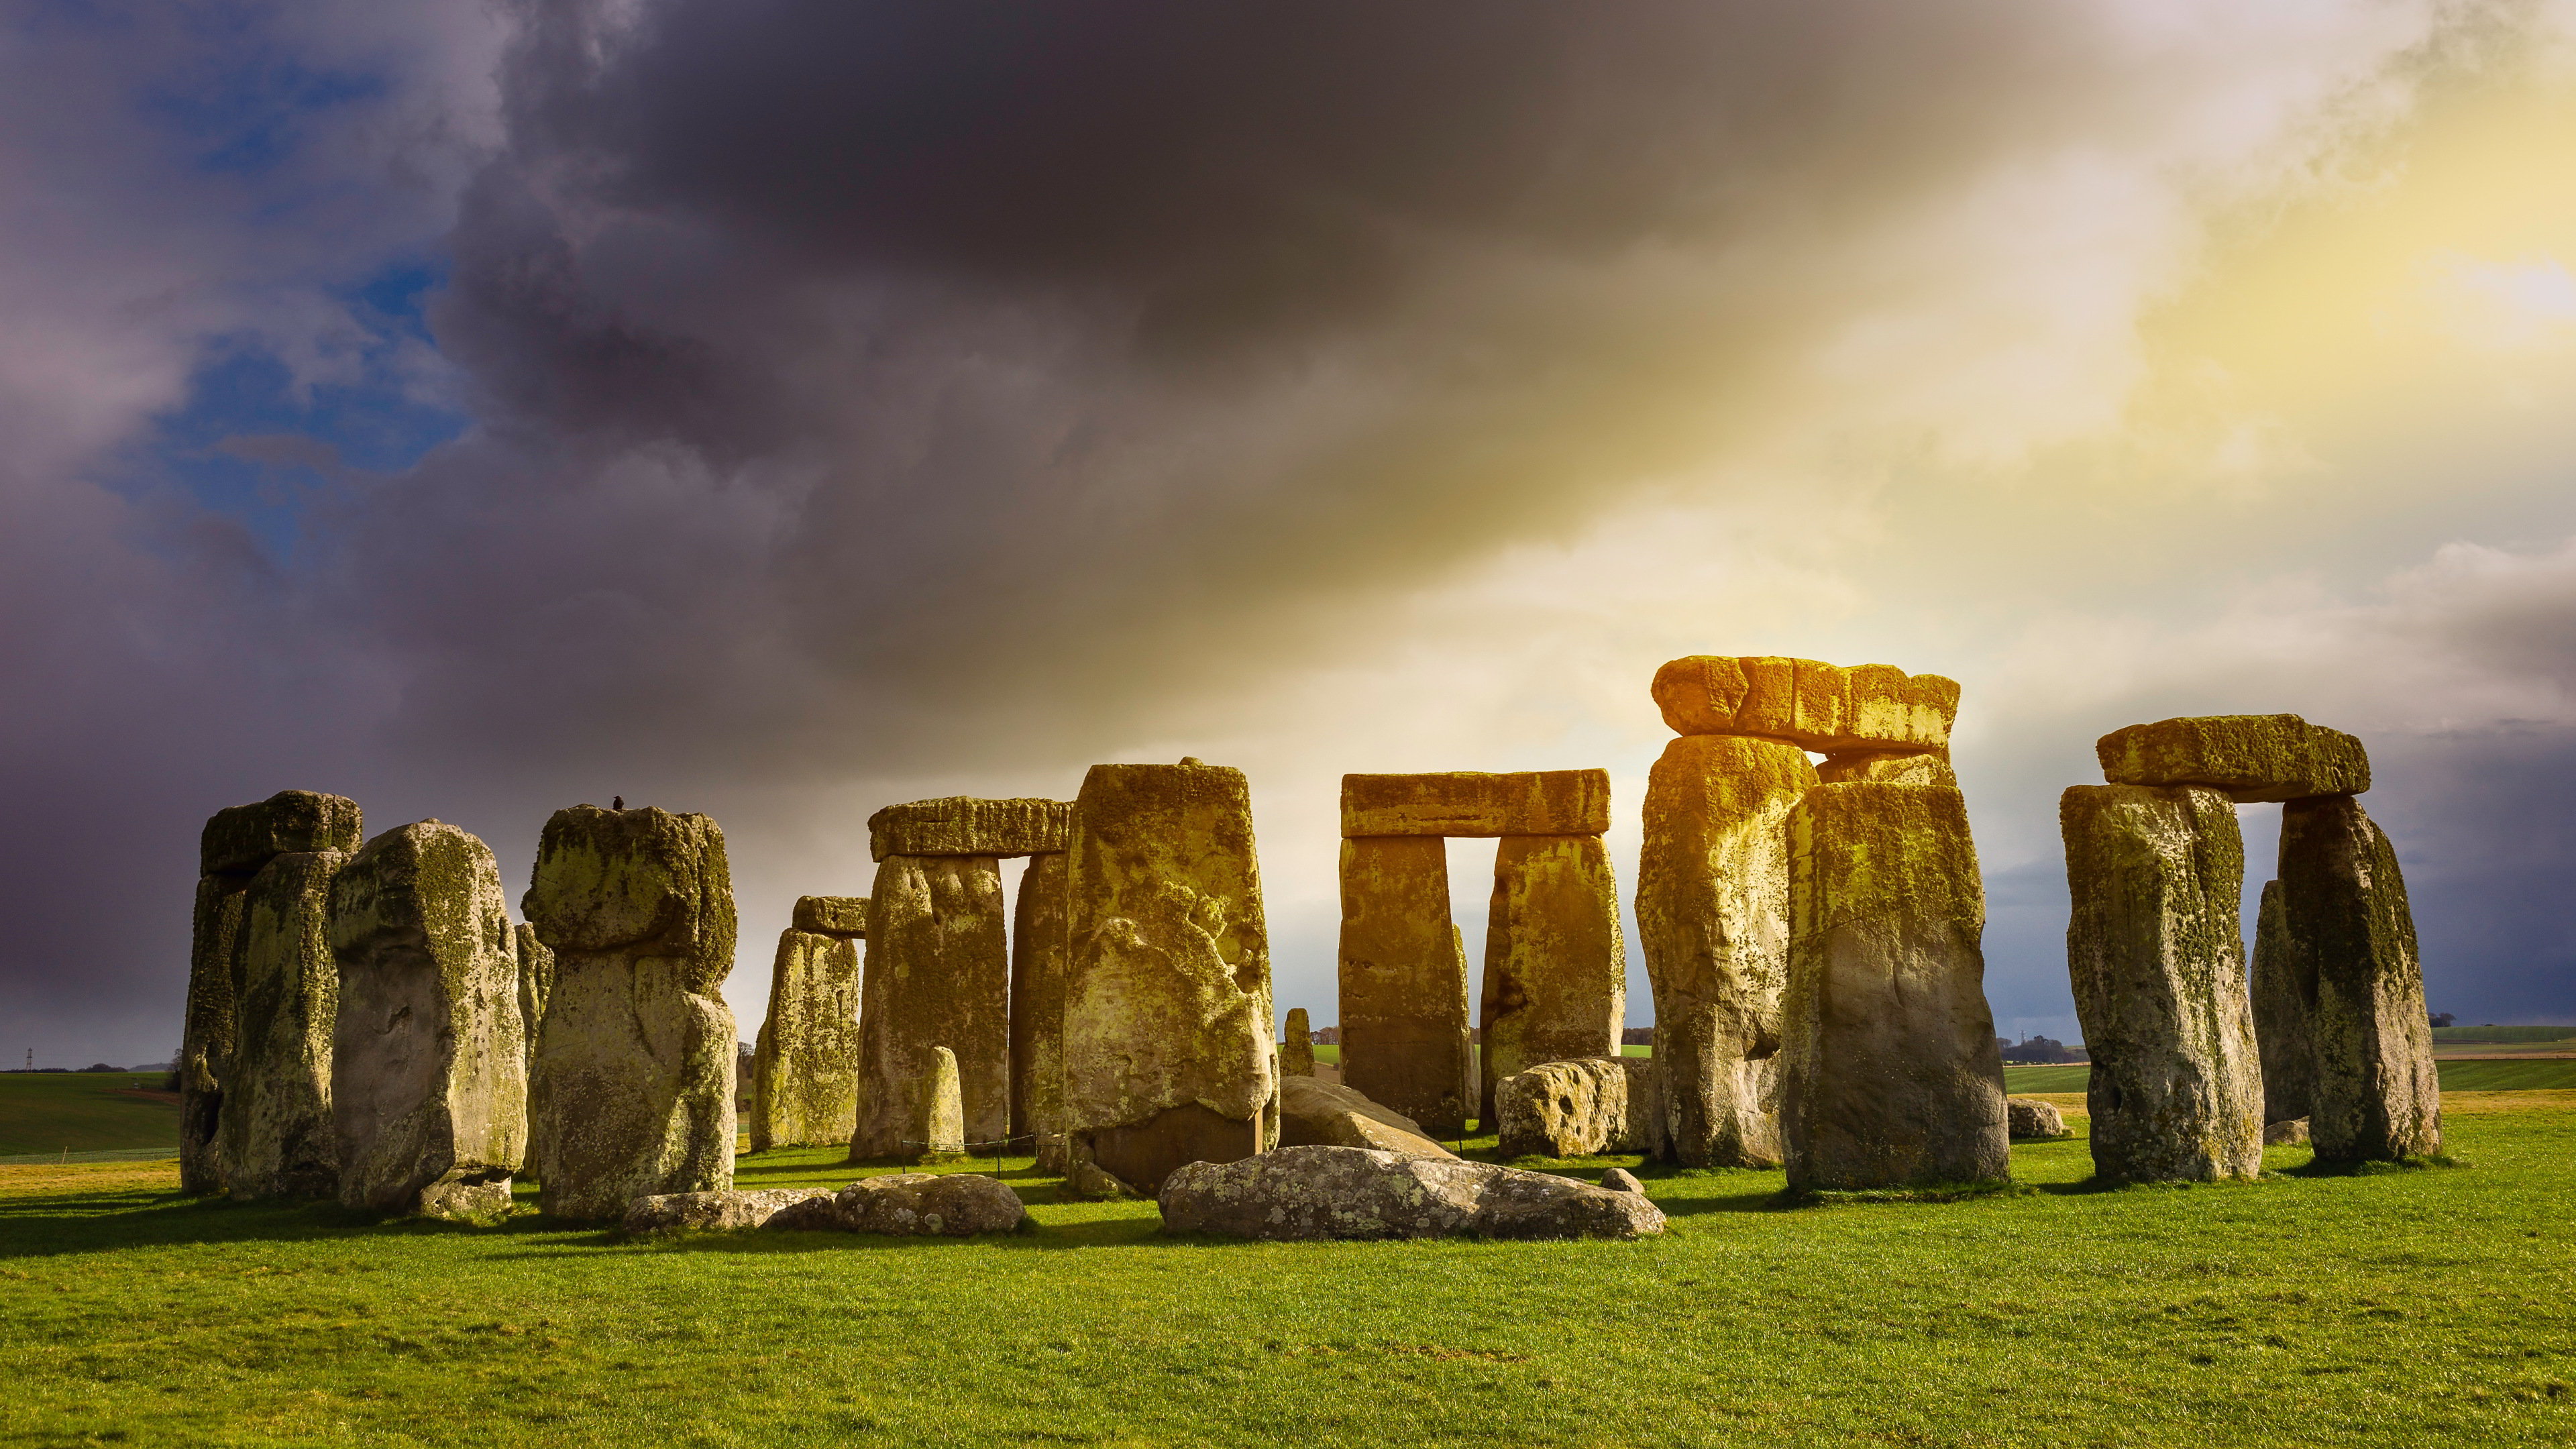 Stonehenge Wallpapers Full HD 84AYKR7   4USkY 3840x2160